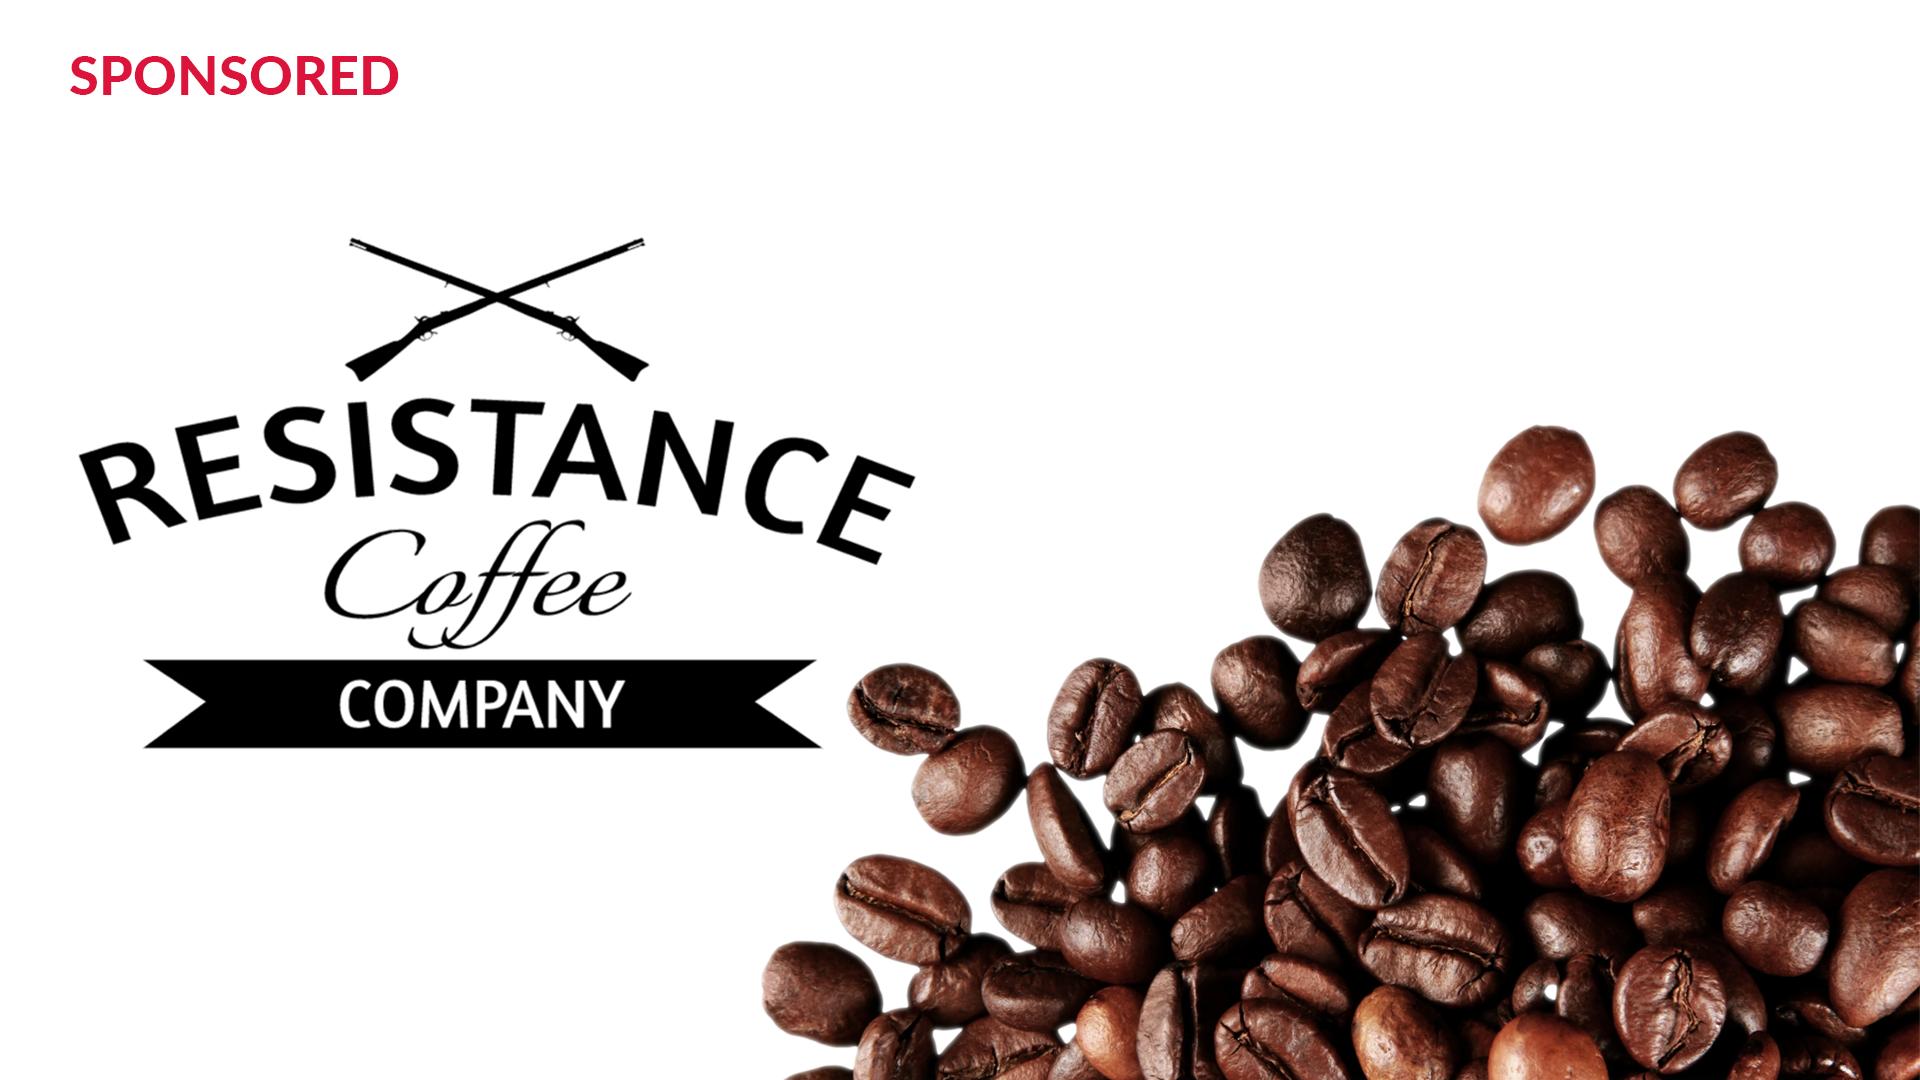 Resistance Coffee sponsored ad